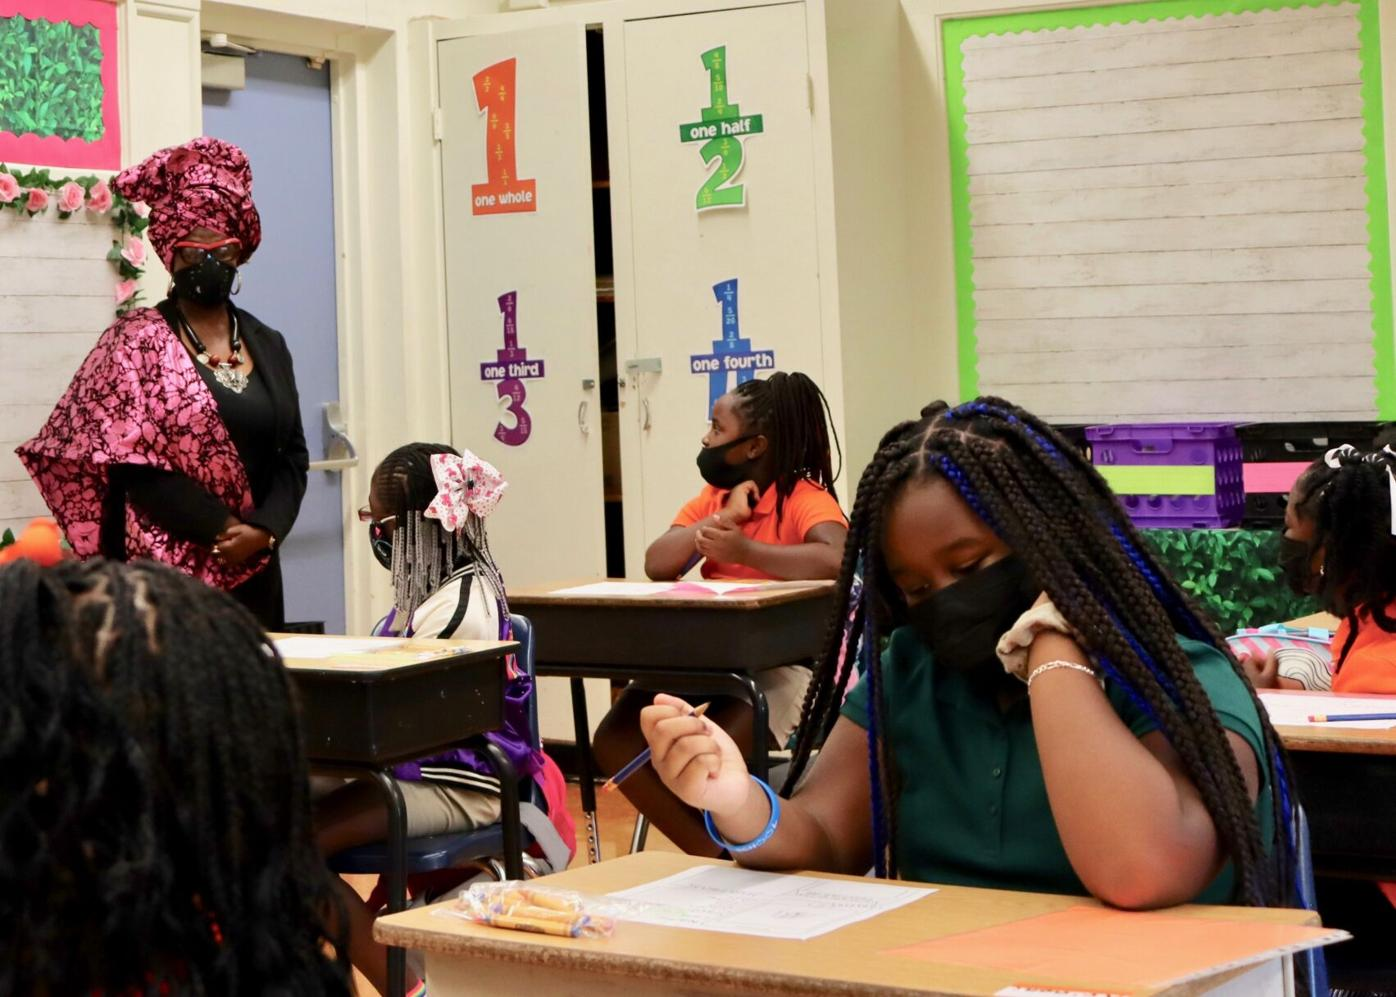 Bendross-Mindingal Liberty City Elementary School